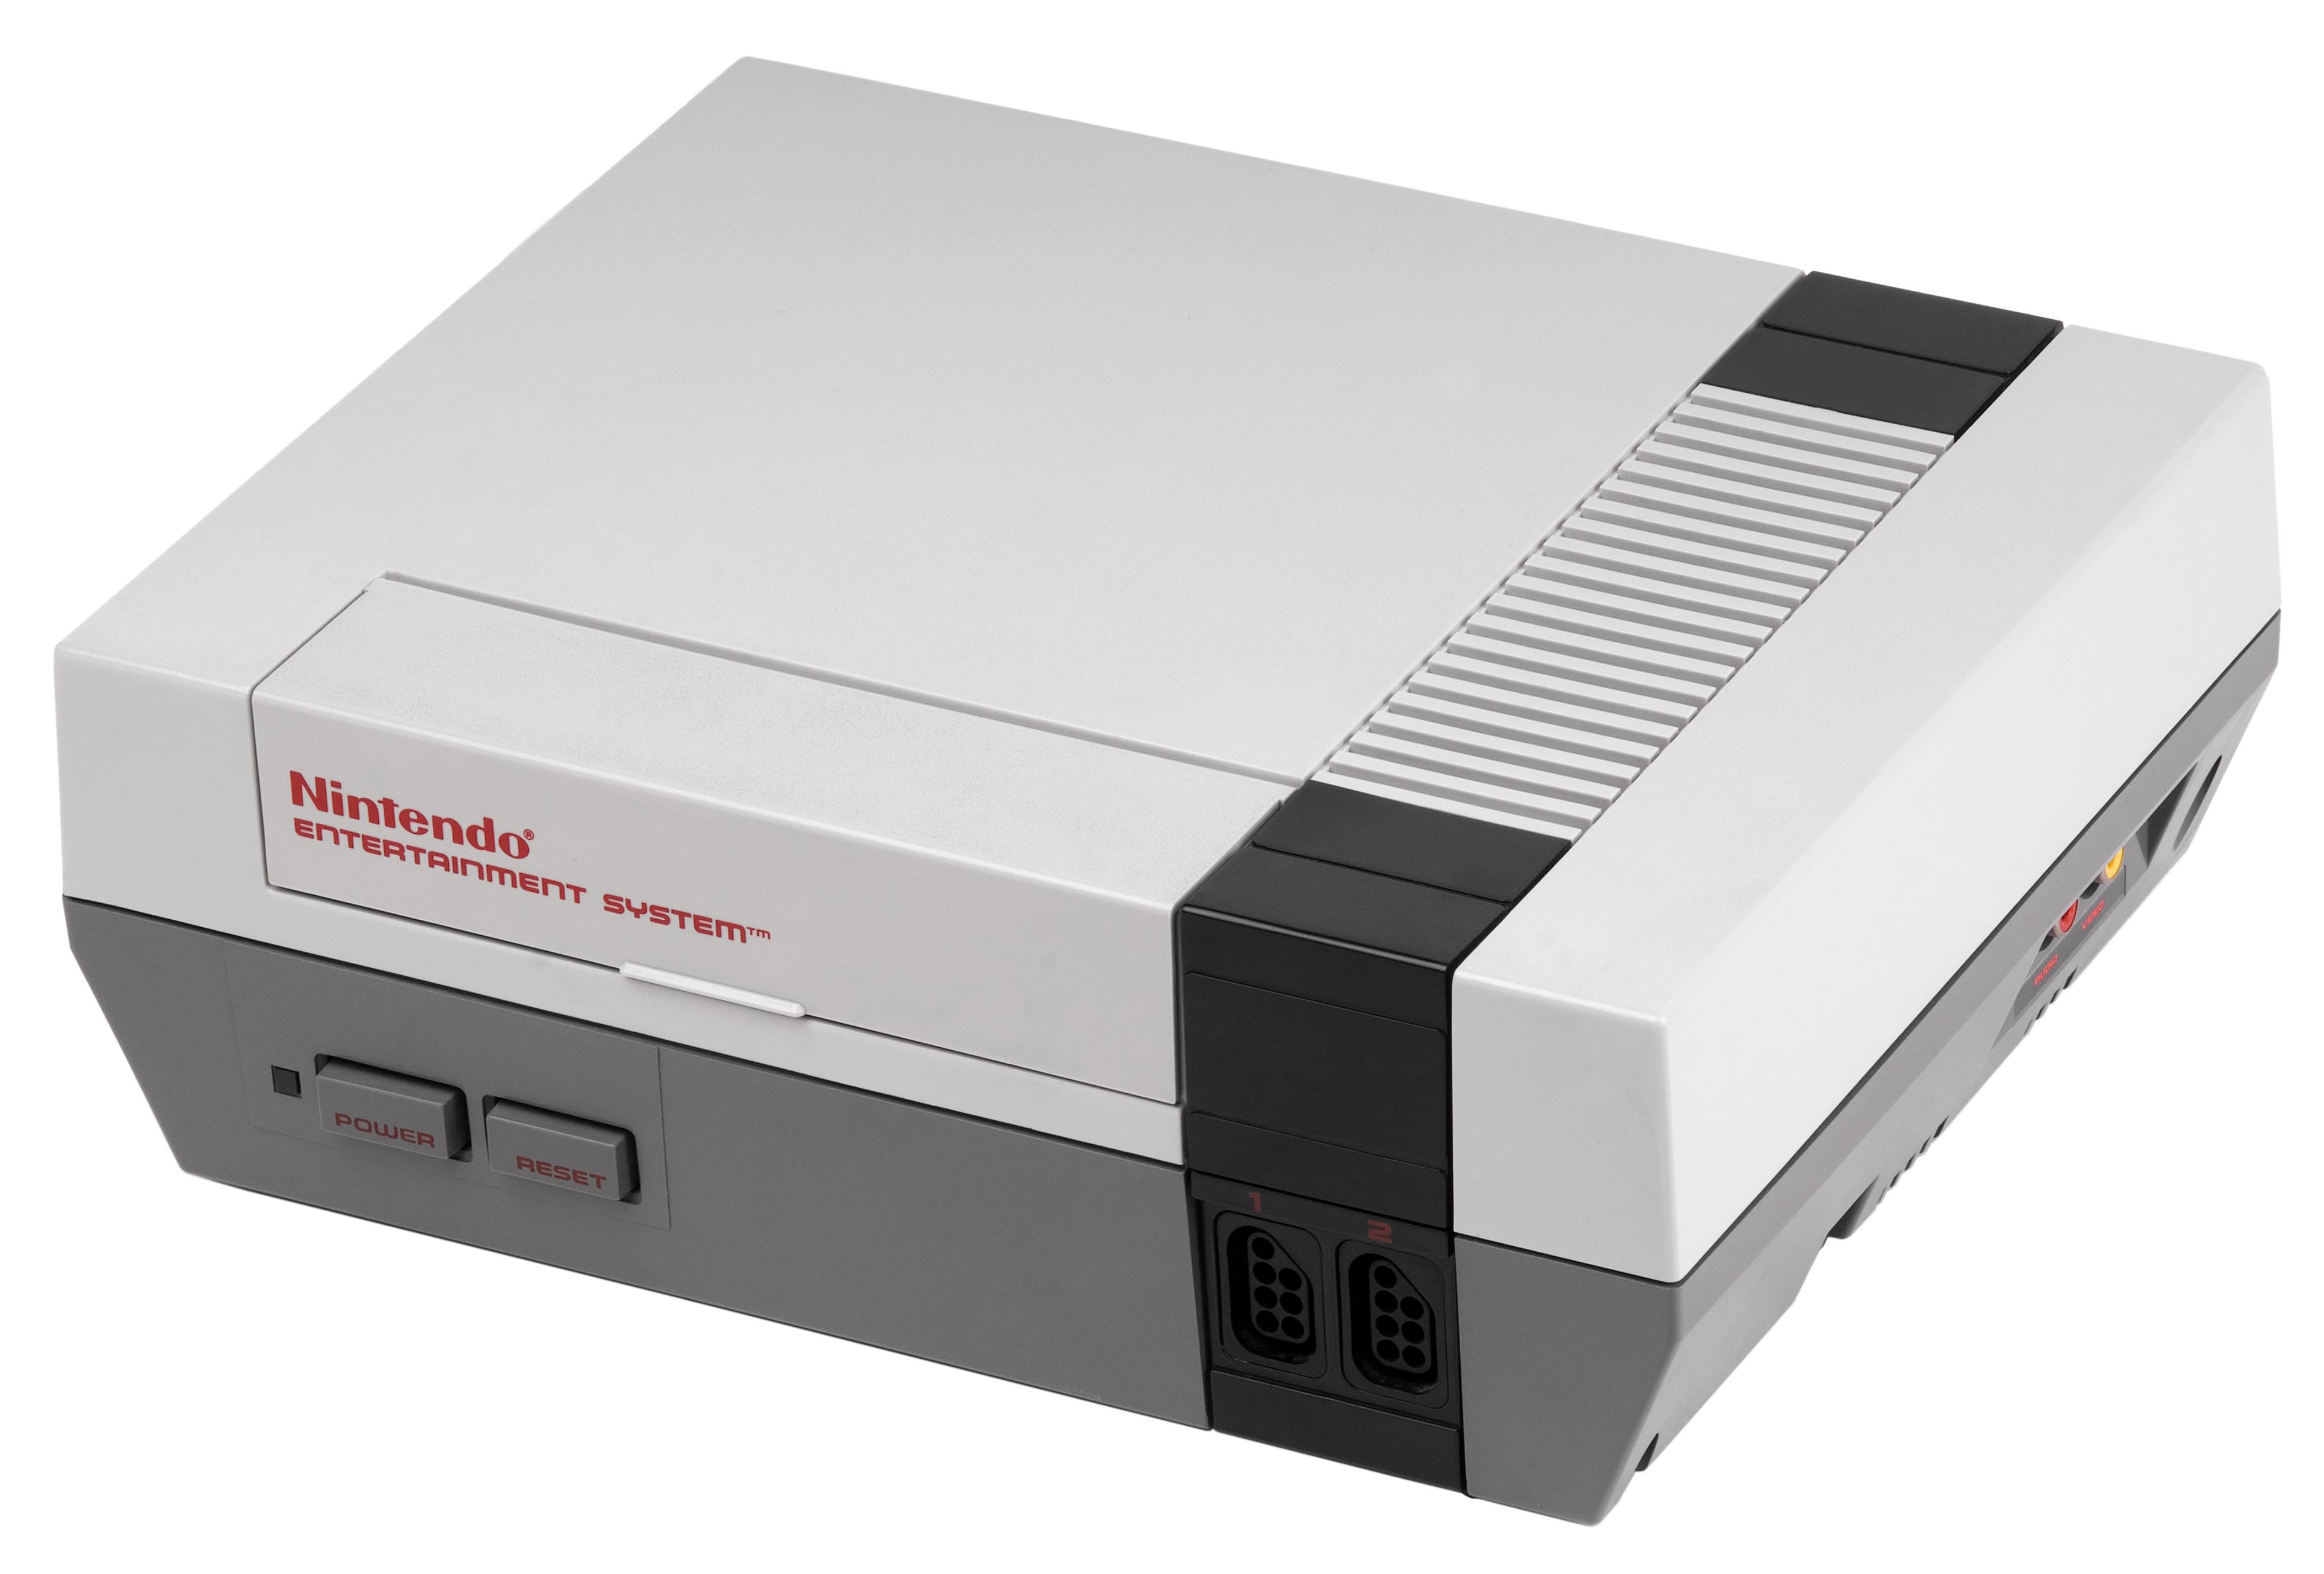 Nintendo Retrospective: The Nintendo Entertainment System